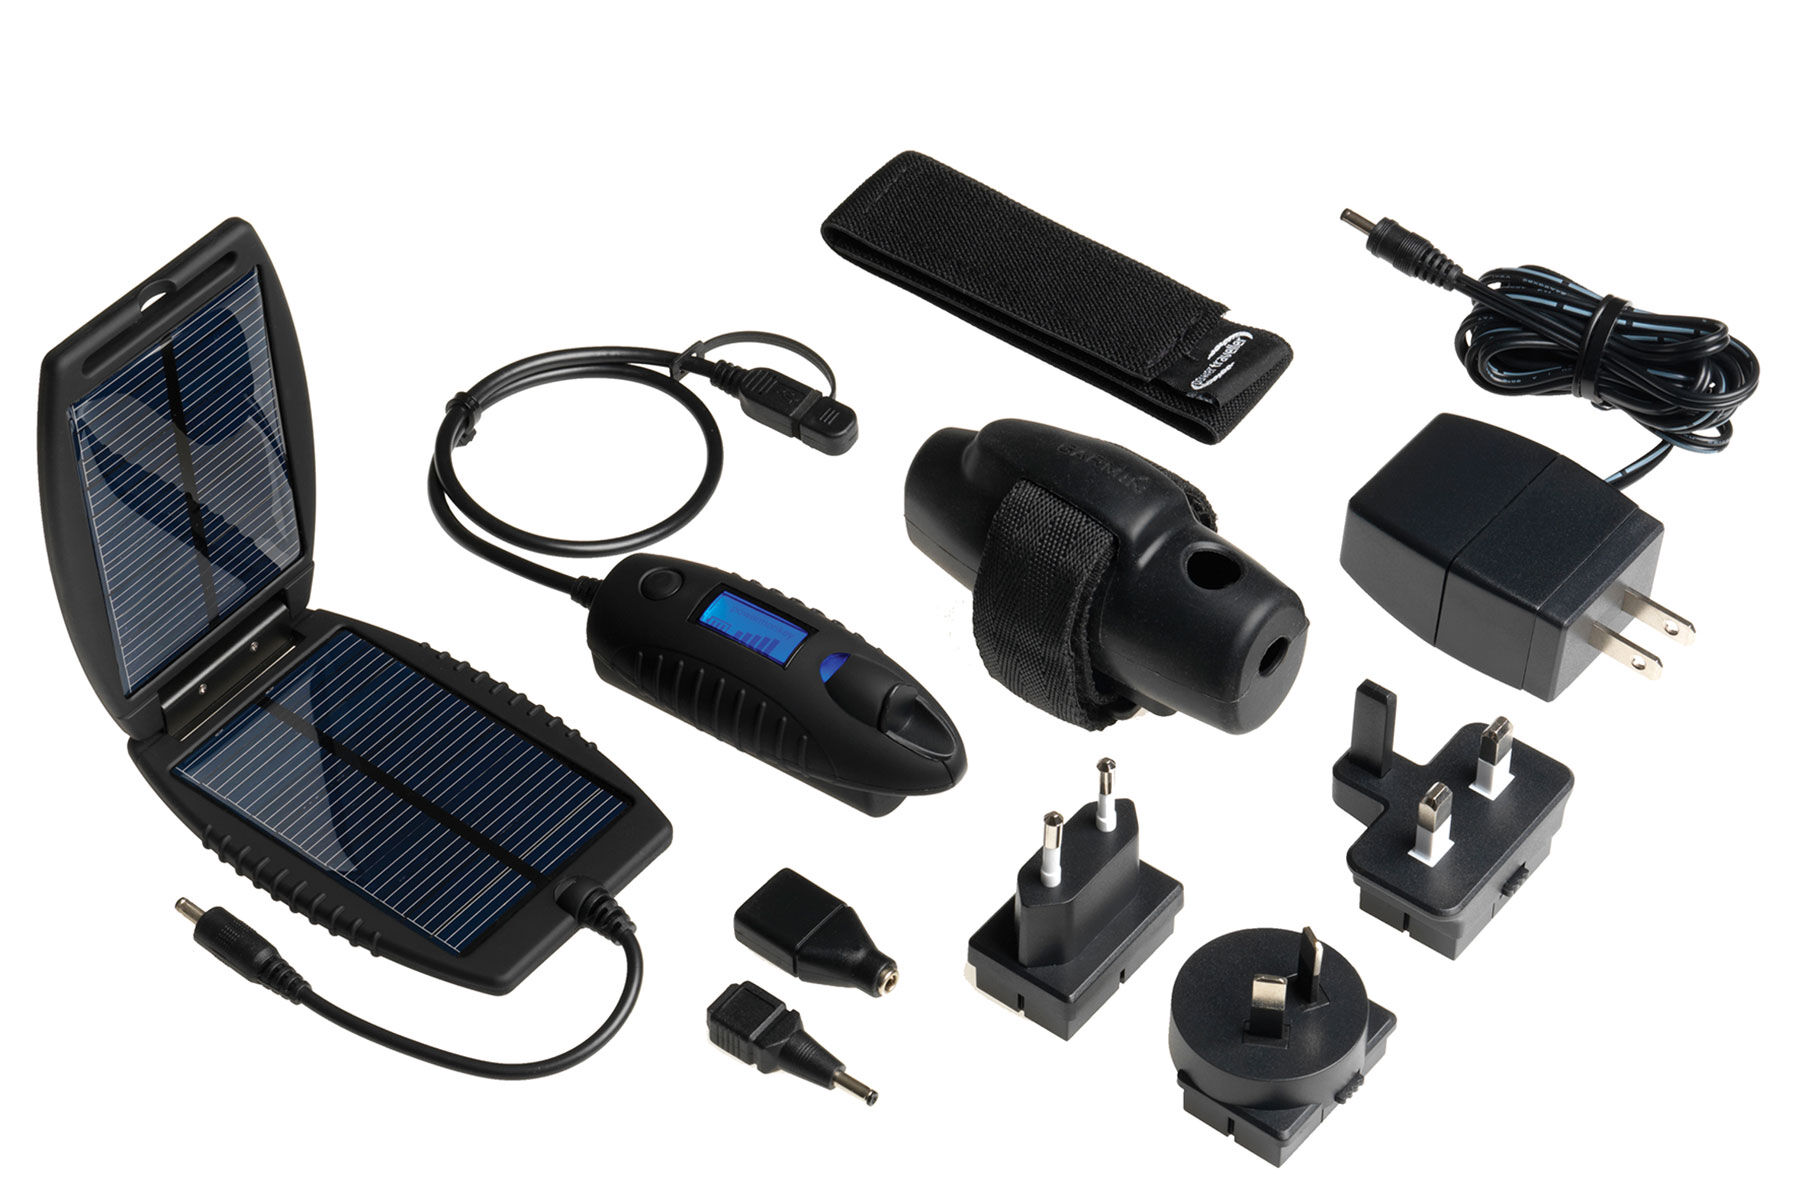 Garmin X10 Gps Entfernungsmesser : Bushnell hybrid laser gps golf entfernungsmesser